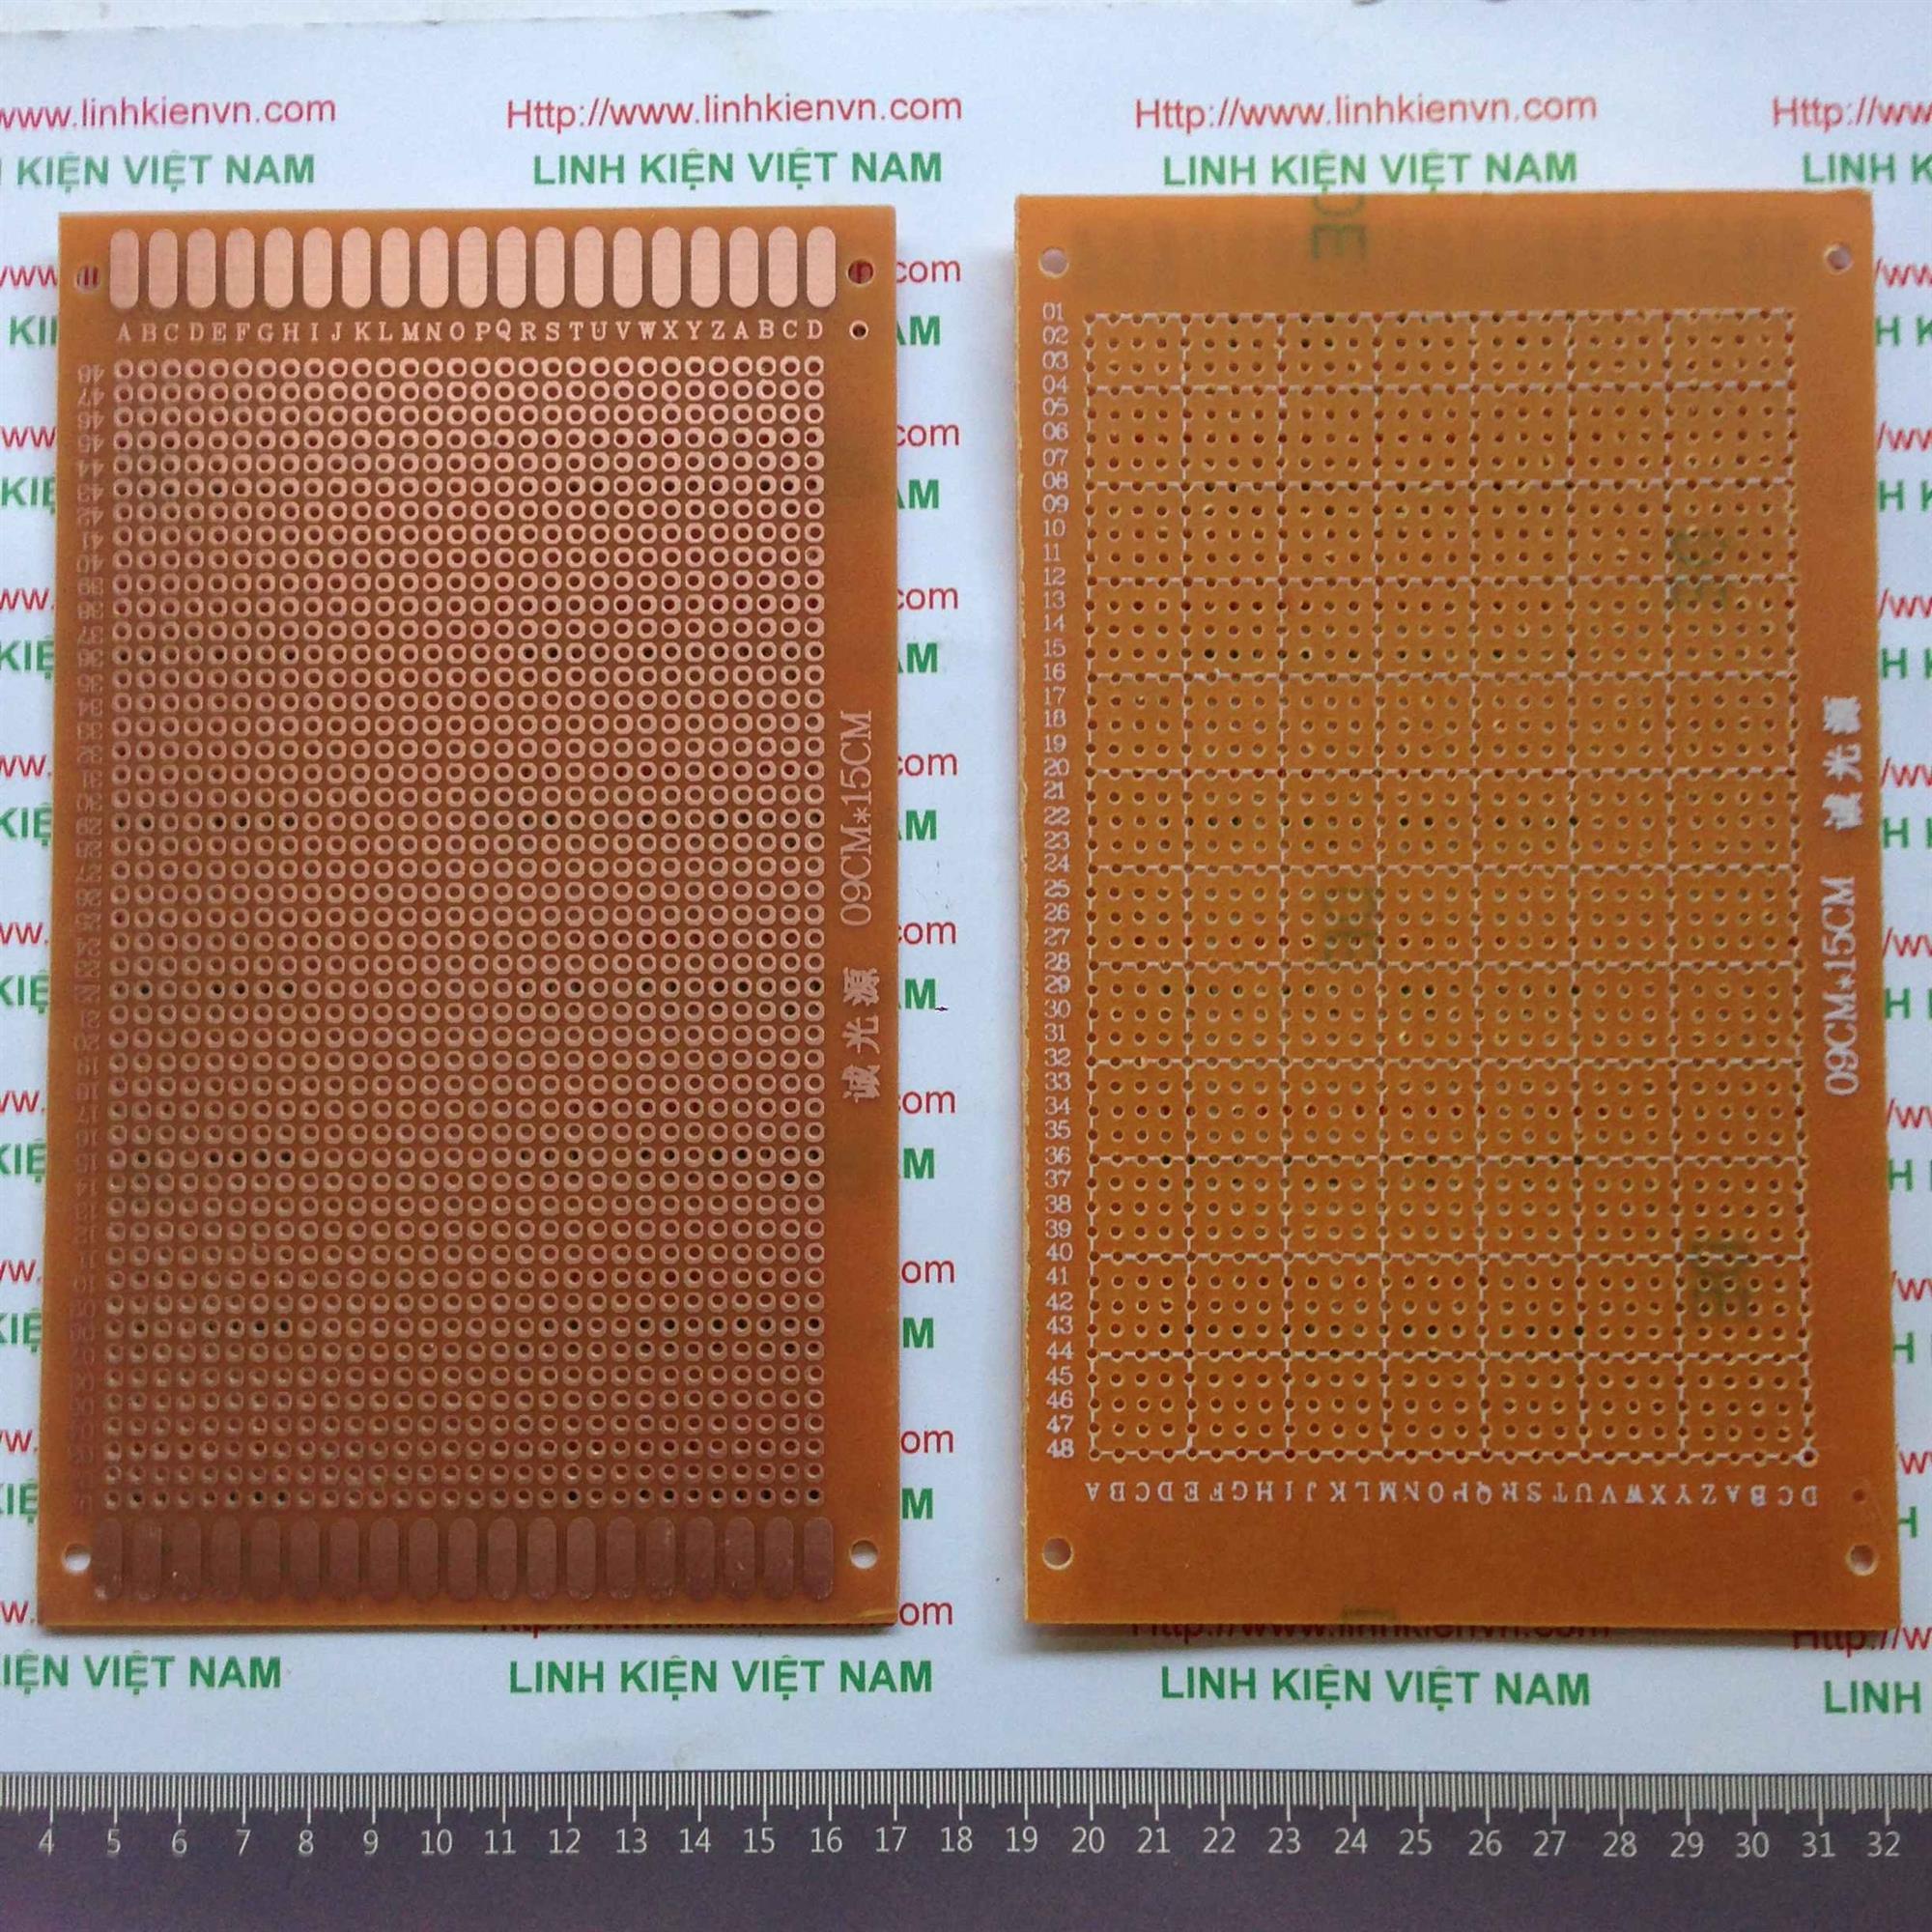 PCB 9x15cm - B9H14